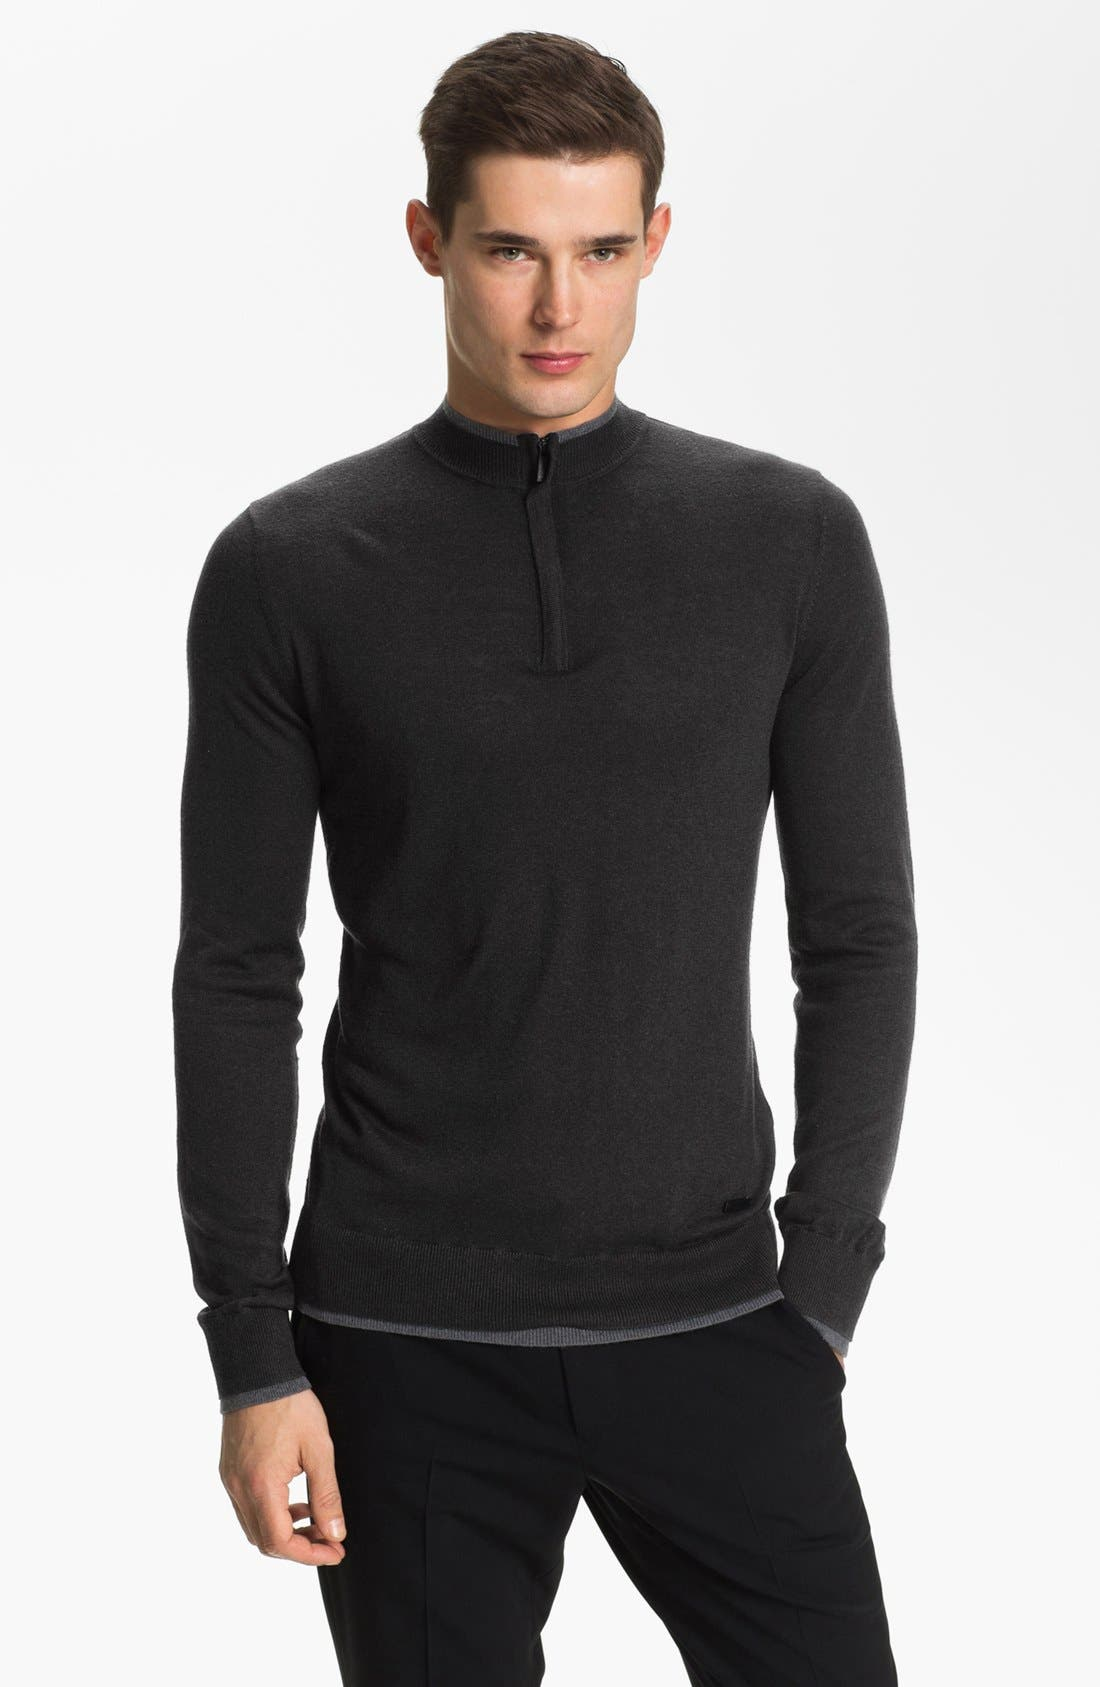 Alternate Image 1 Selected - Armani Collezioni Quarter Zip Sweater